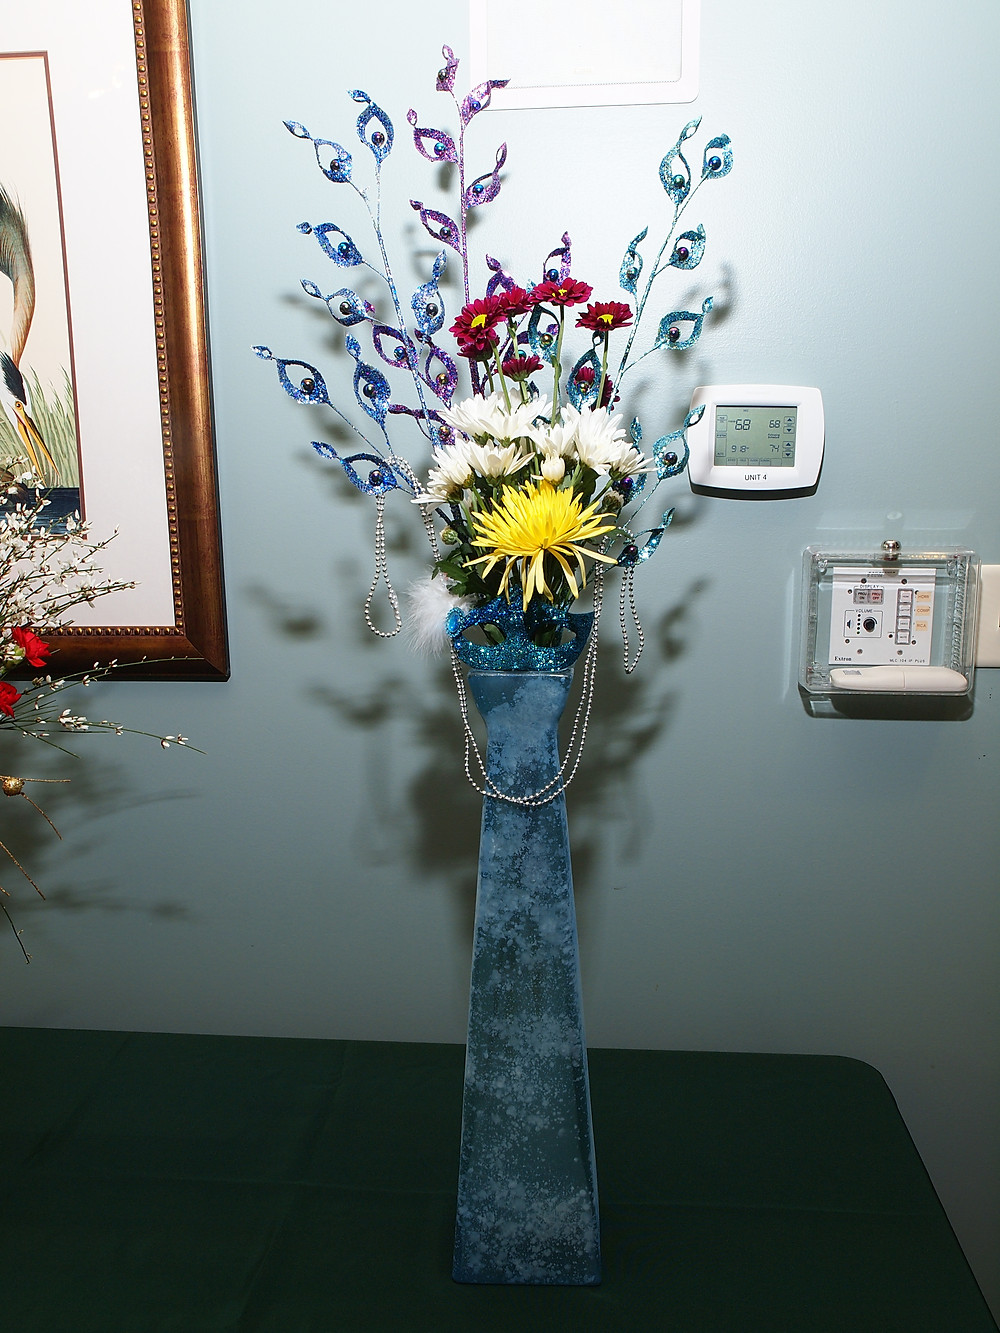 Judy Pfister's Floral Design Exhibit